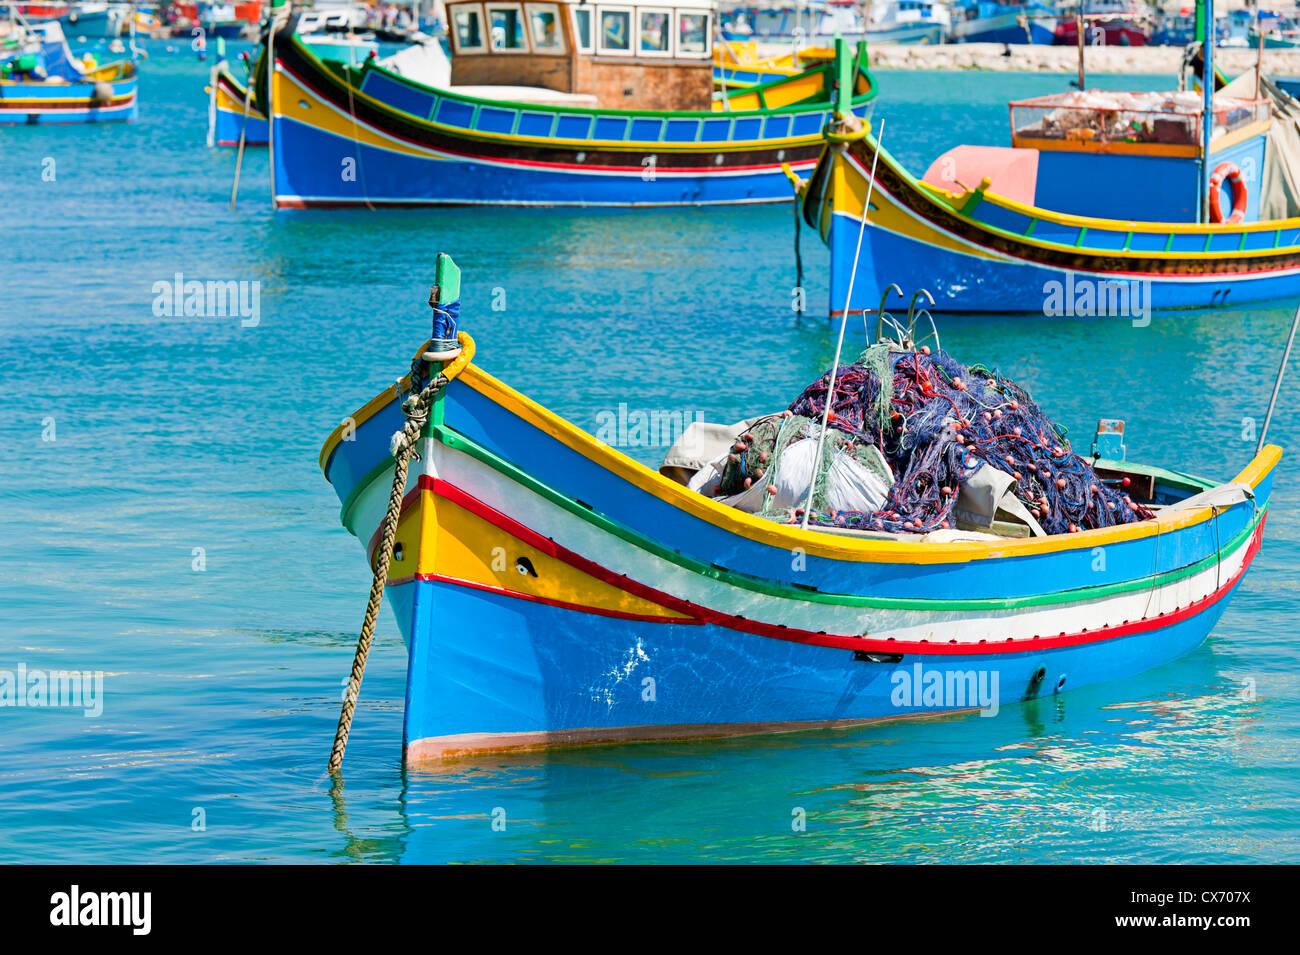 Bateaux de pêche de Marsaxlokk malte Photo Stock